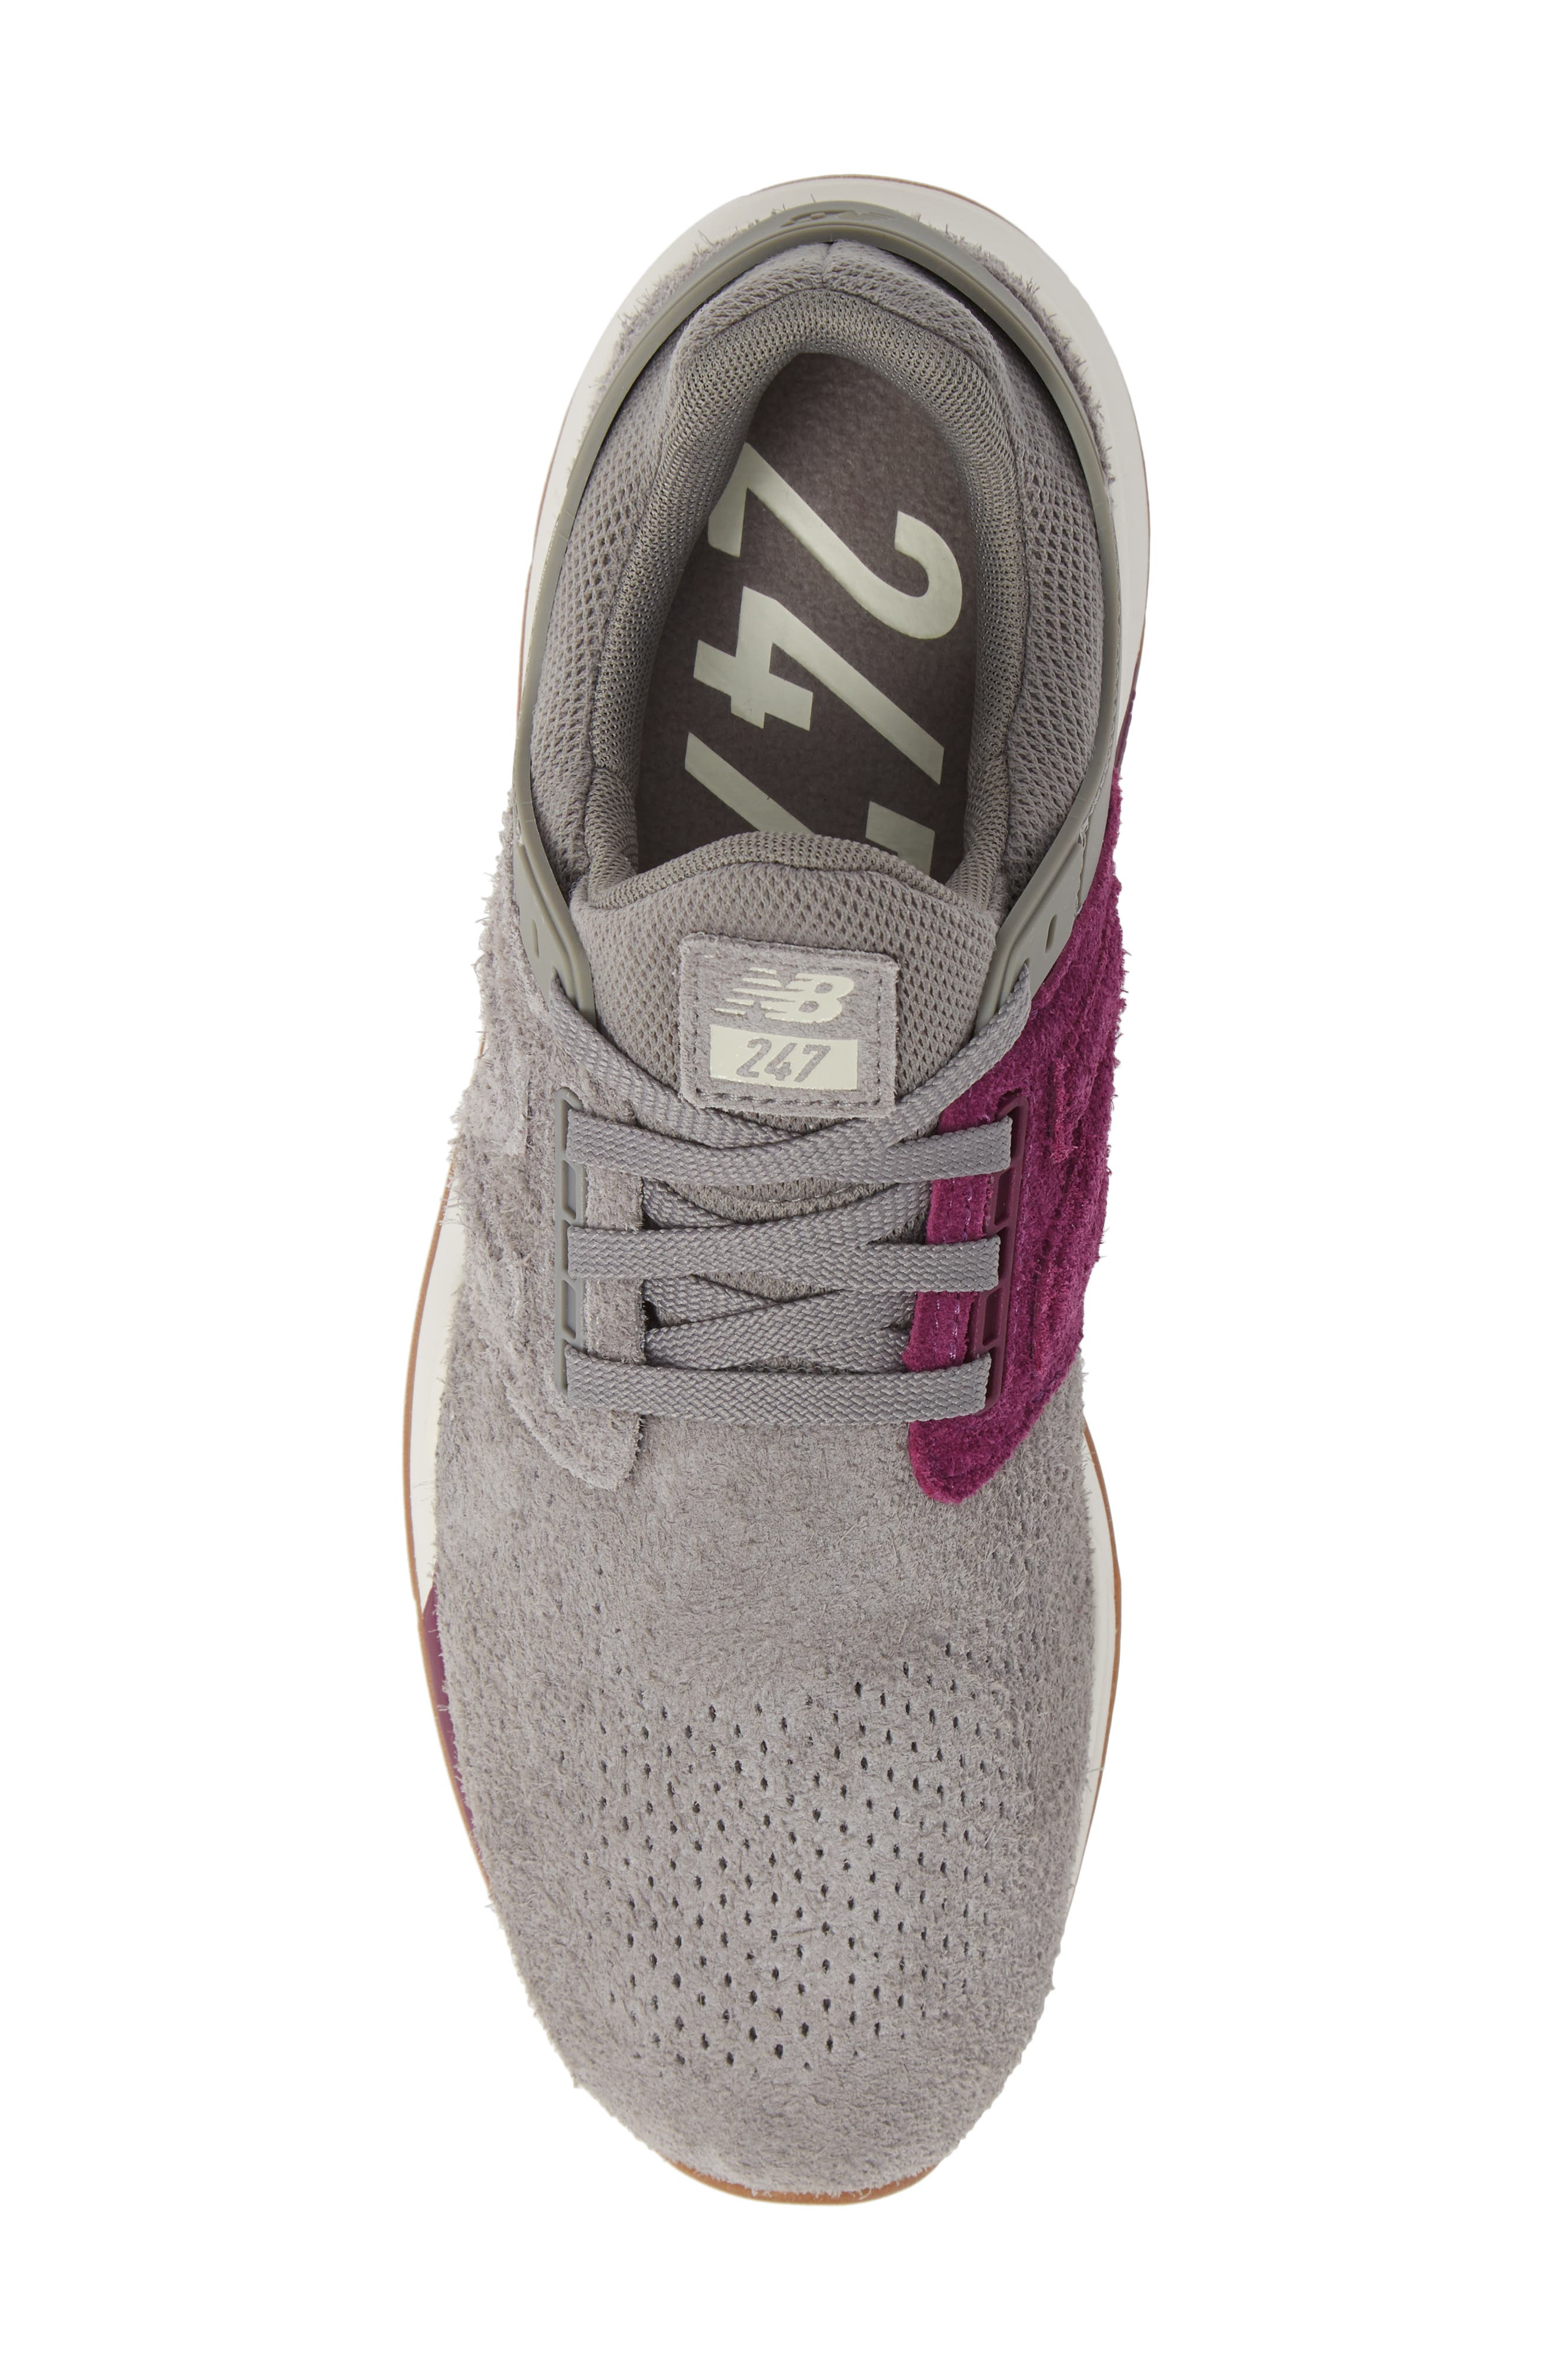 247 Suede Sneaker,                             Alternate thumbnail 5, color,                             MARBLEHEAD SUEDE